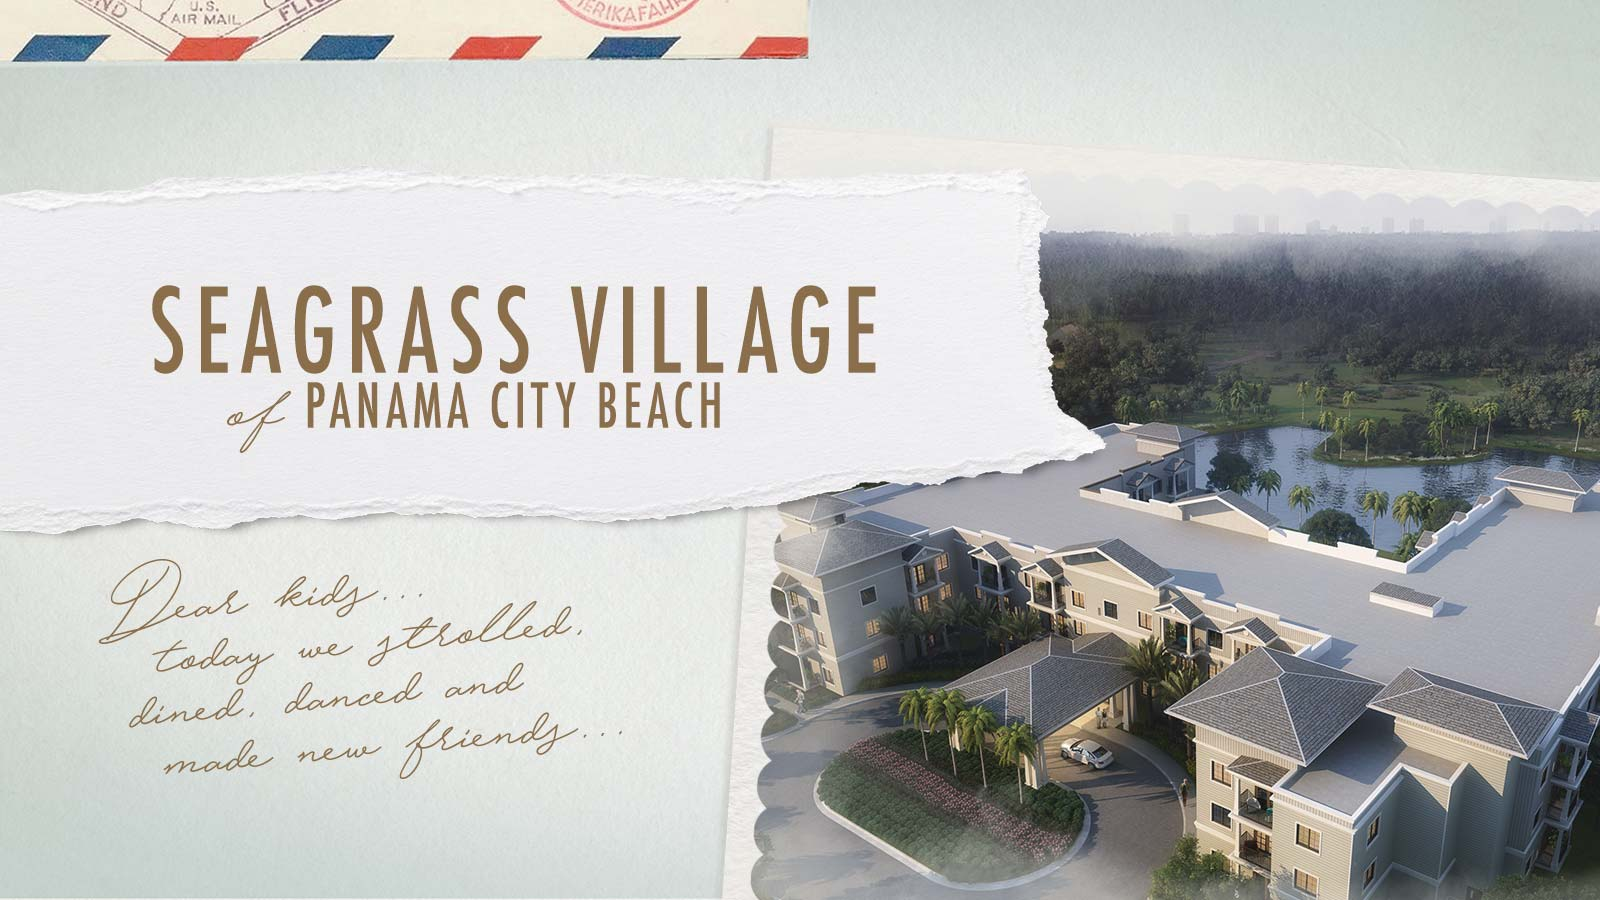 Seagrass Village of Panama City Beach